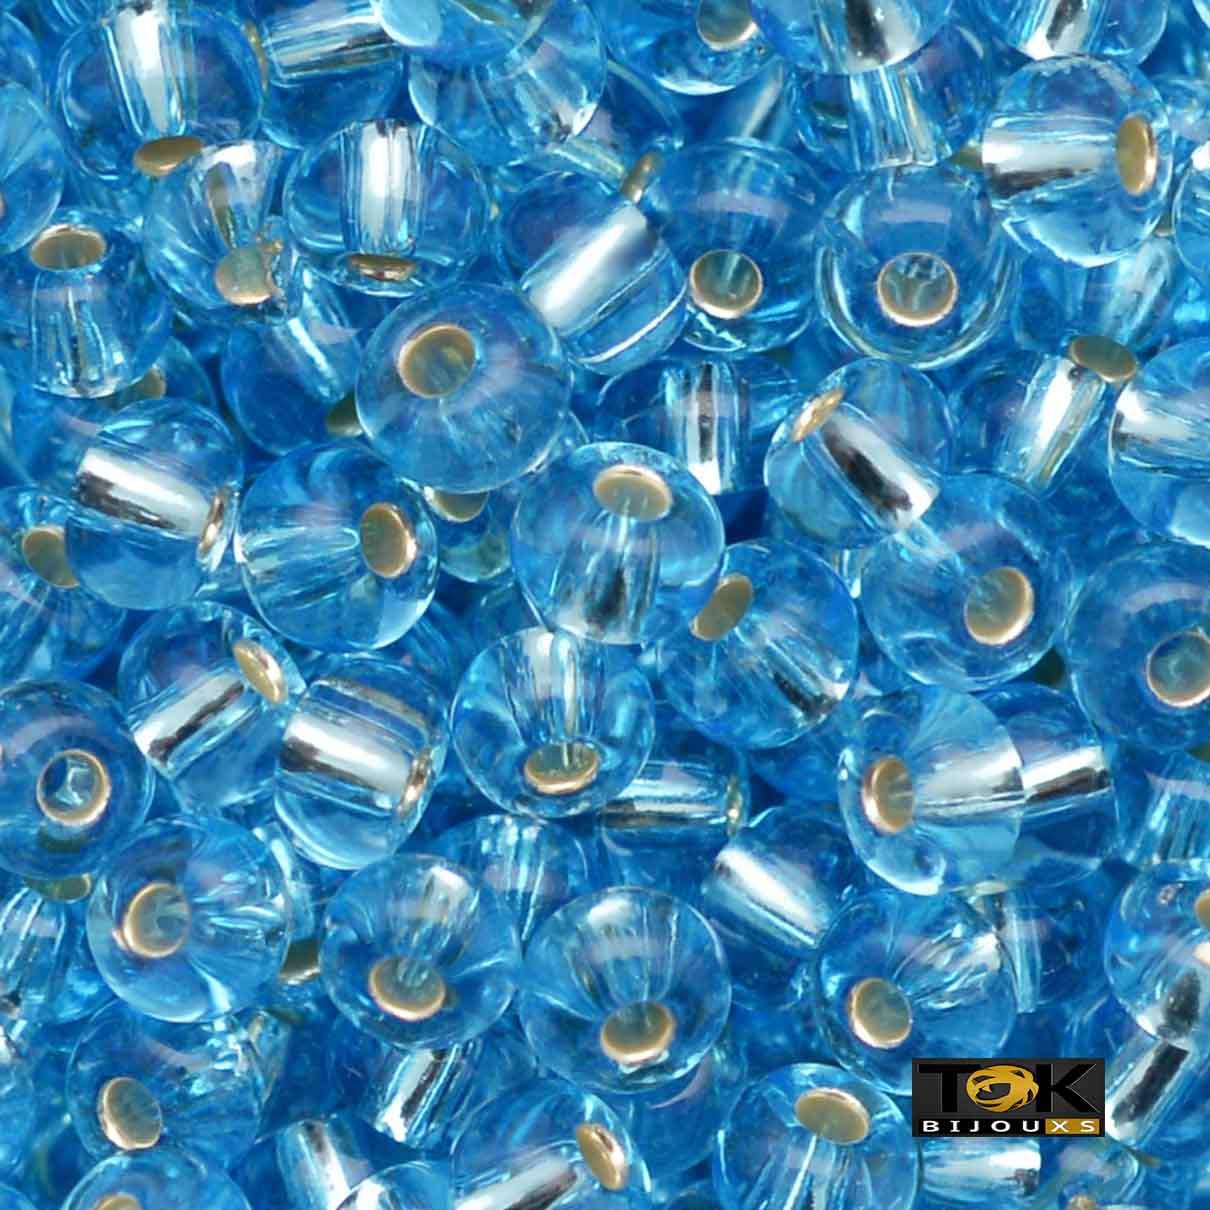 Missangão Jablonex - Azul Turquesa Transparente - 500g